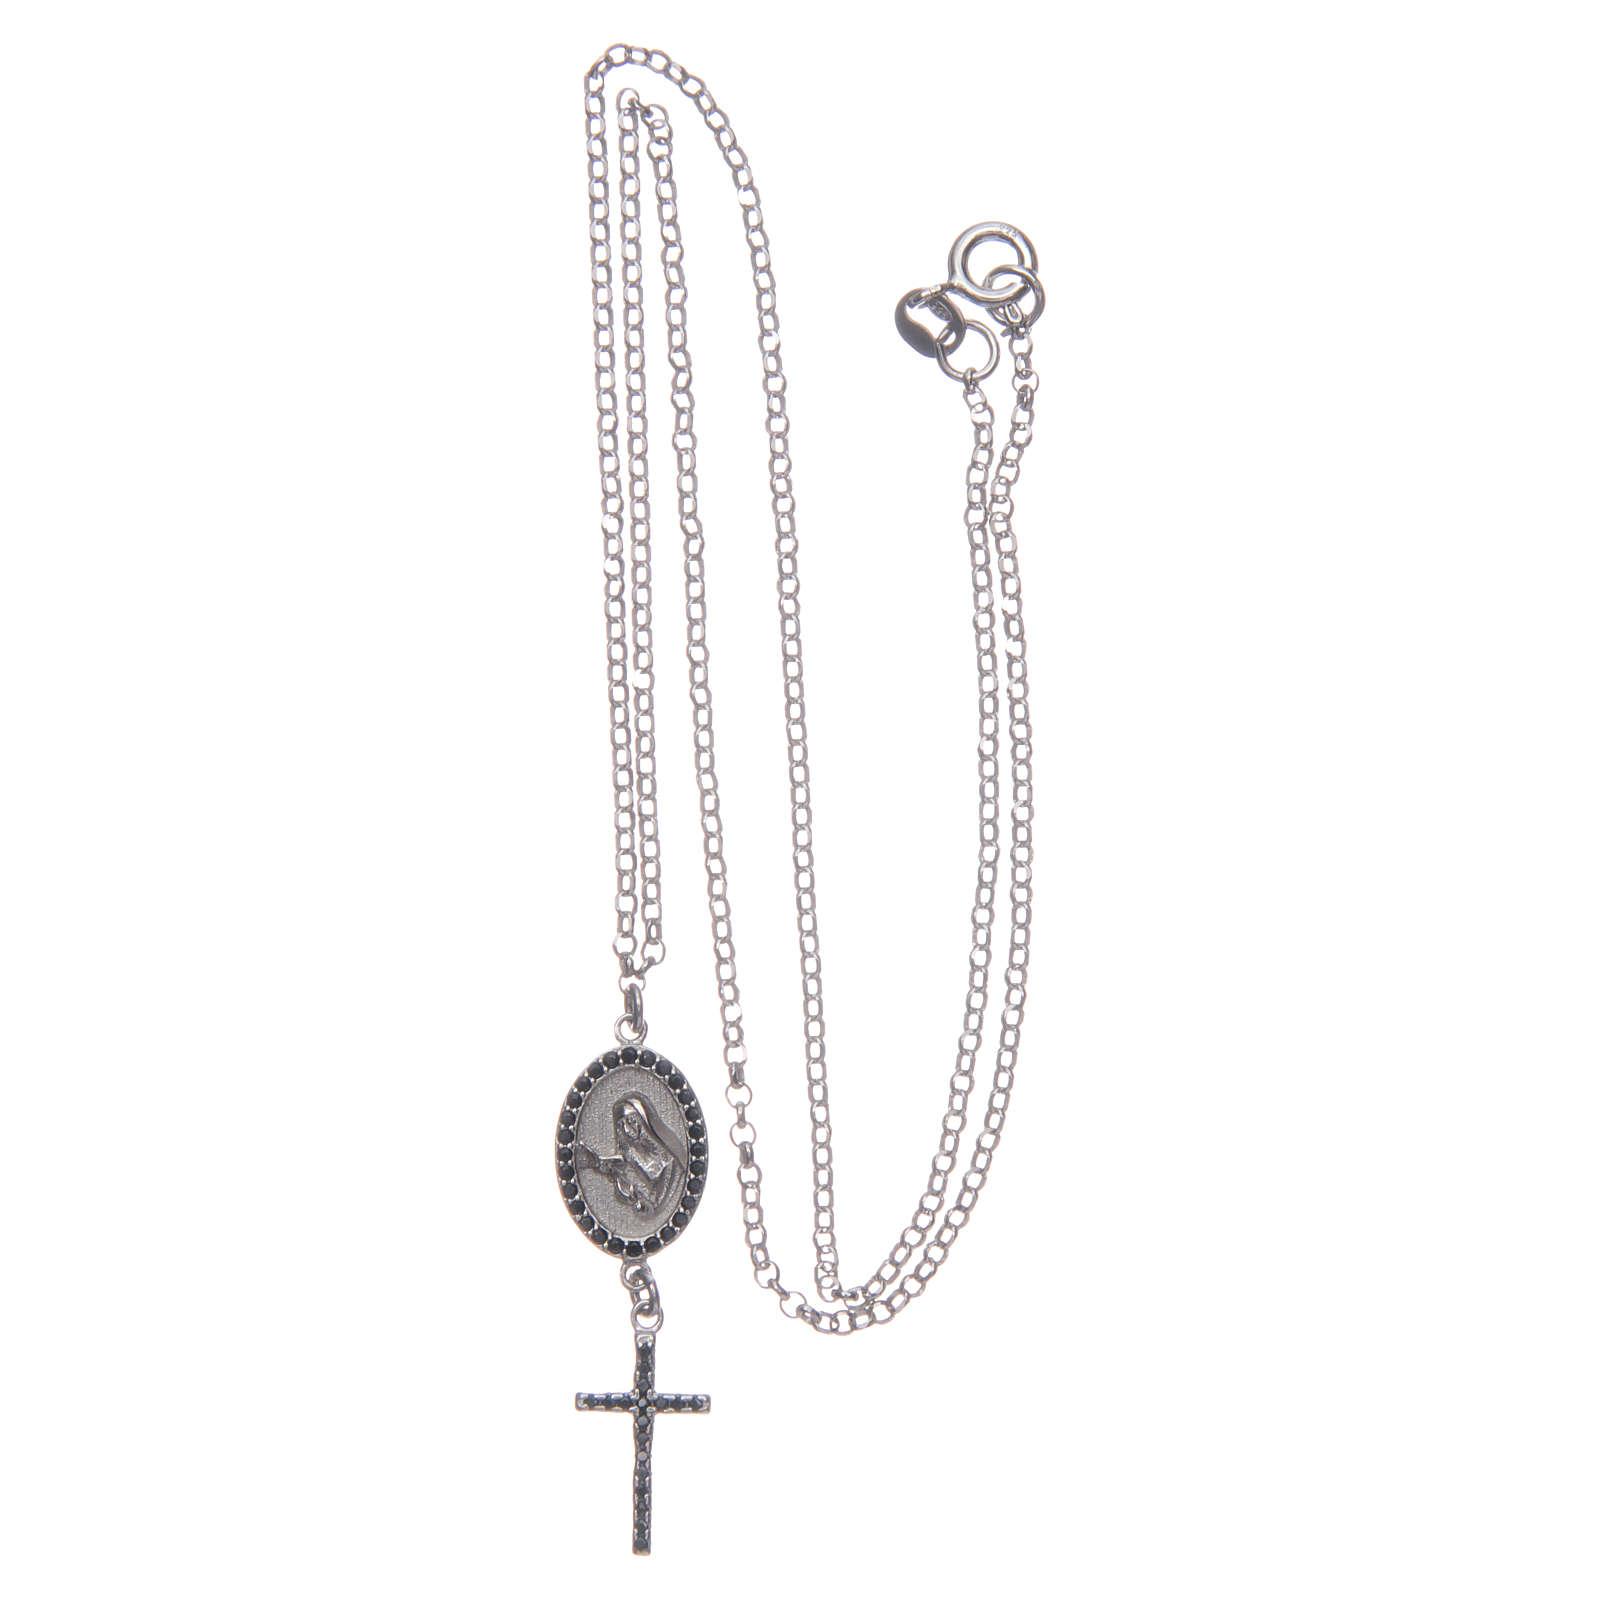 Saint Rita collar necklace in 925 sterling silver black 4